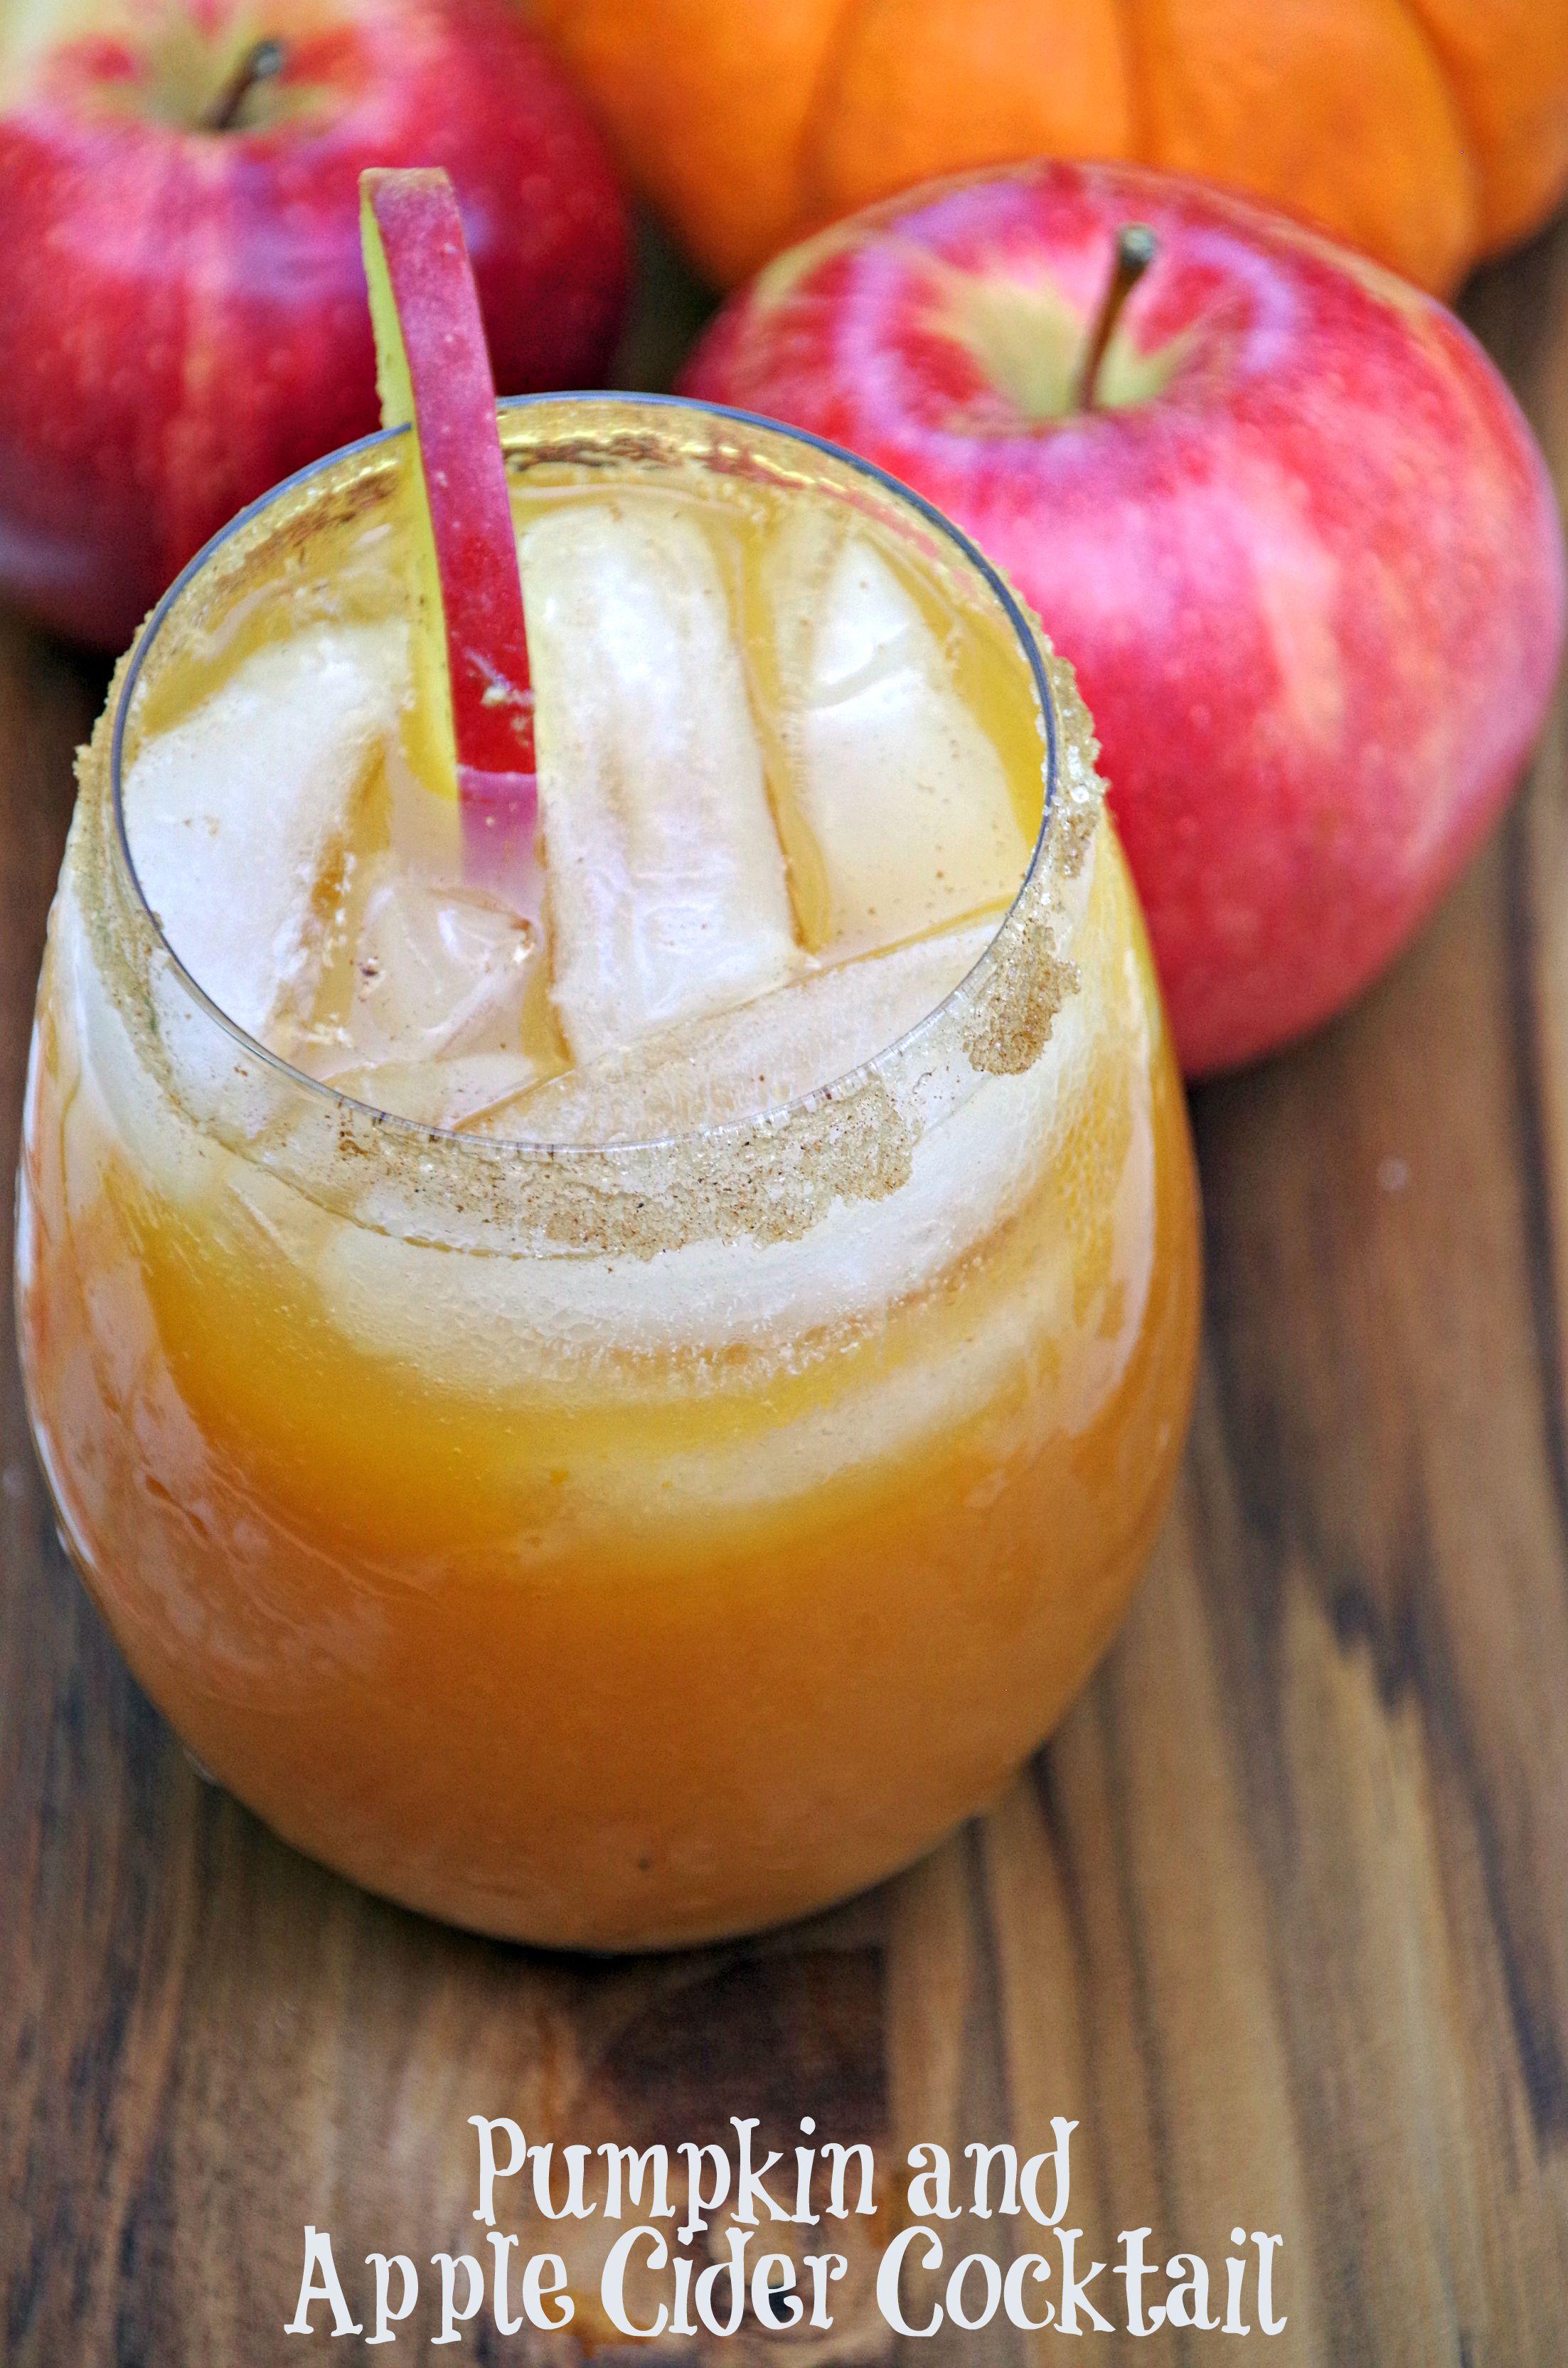 Pumpkin and Apple Cider Cocktail Recipe 2